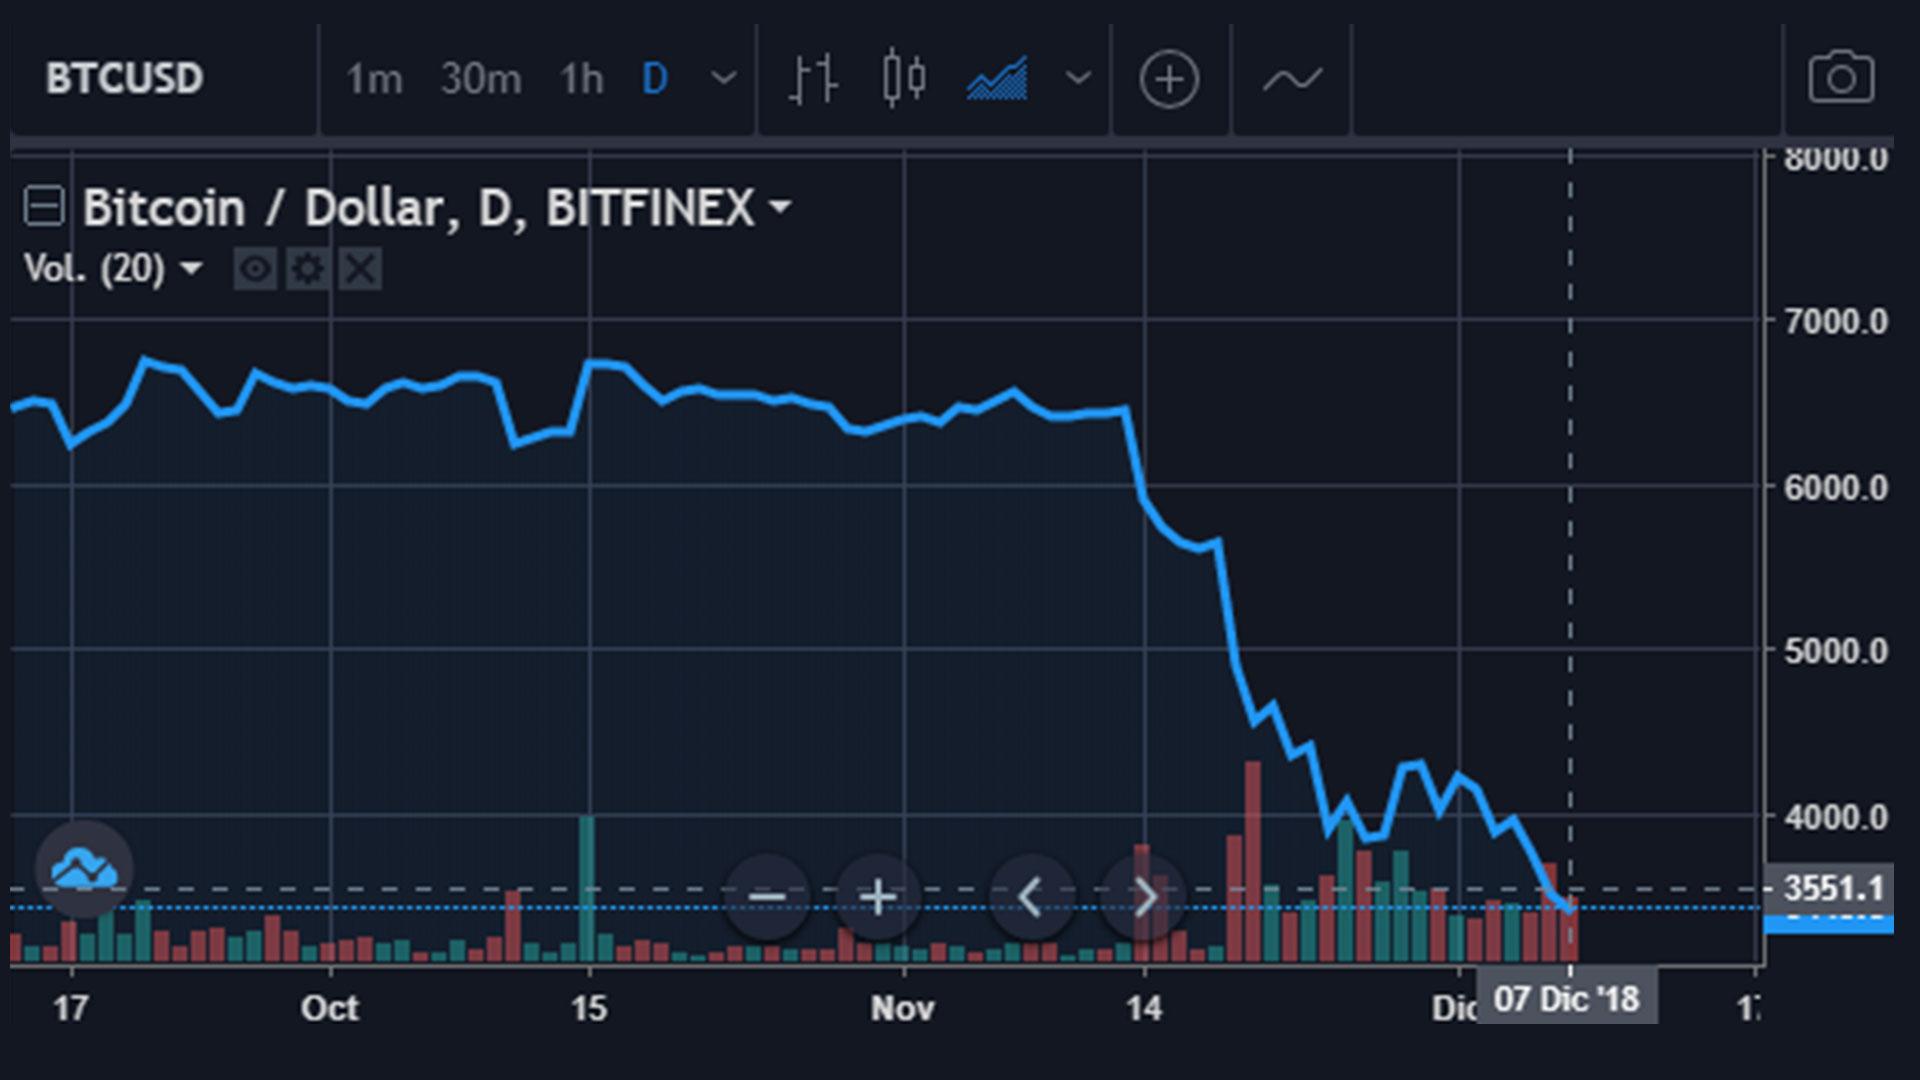 La caída de Bitcoin el 7 de diciembre de 2018